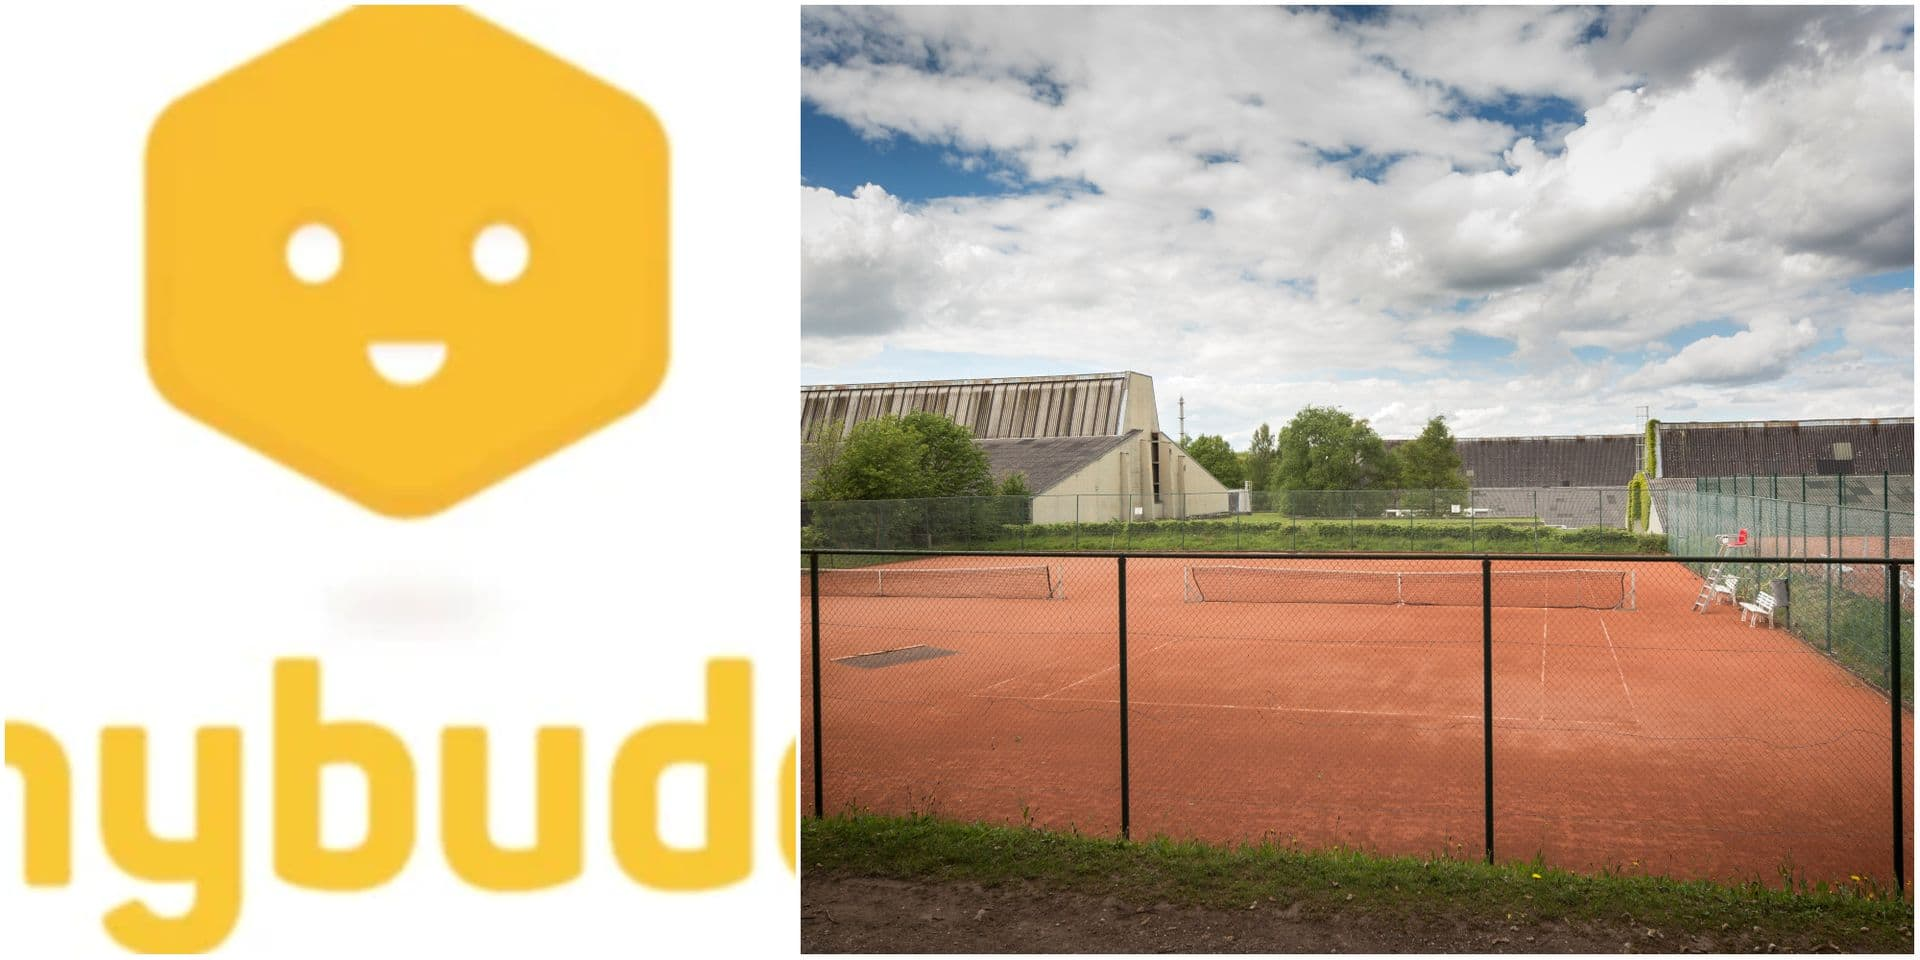 Trouver un terrain de tennis dispo: l'appli anybuddy fait le job